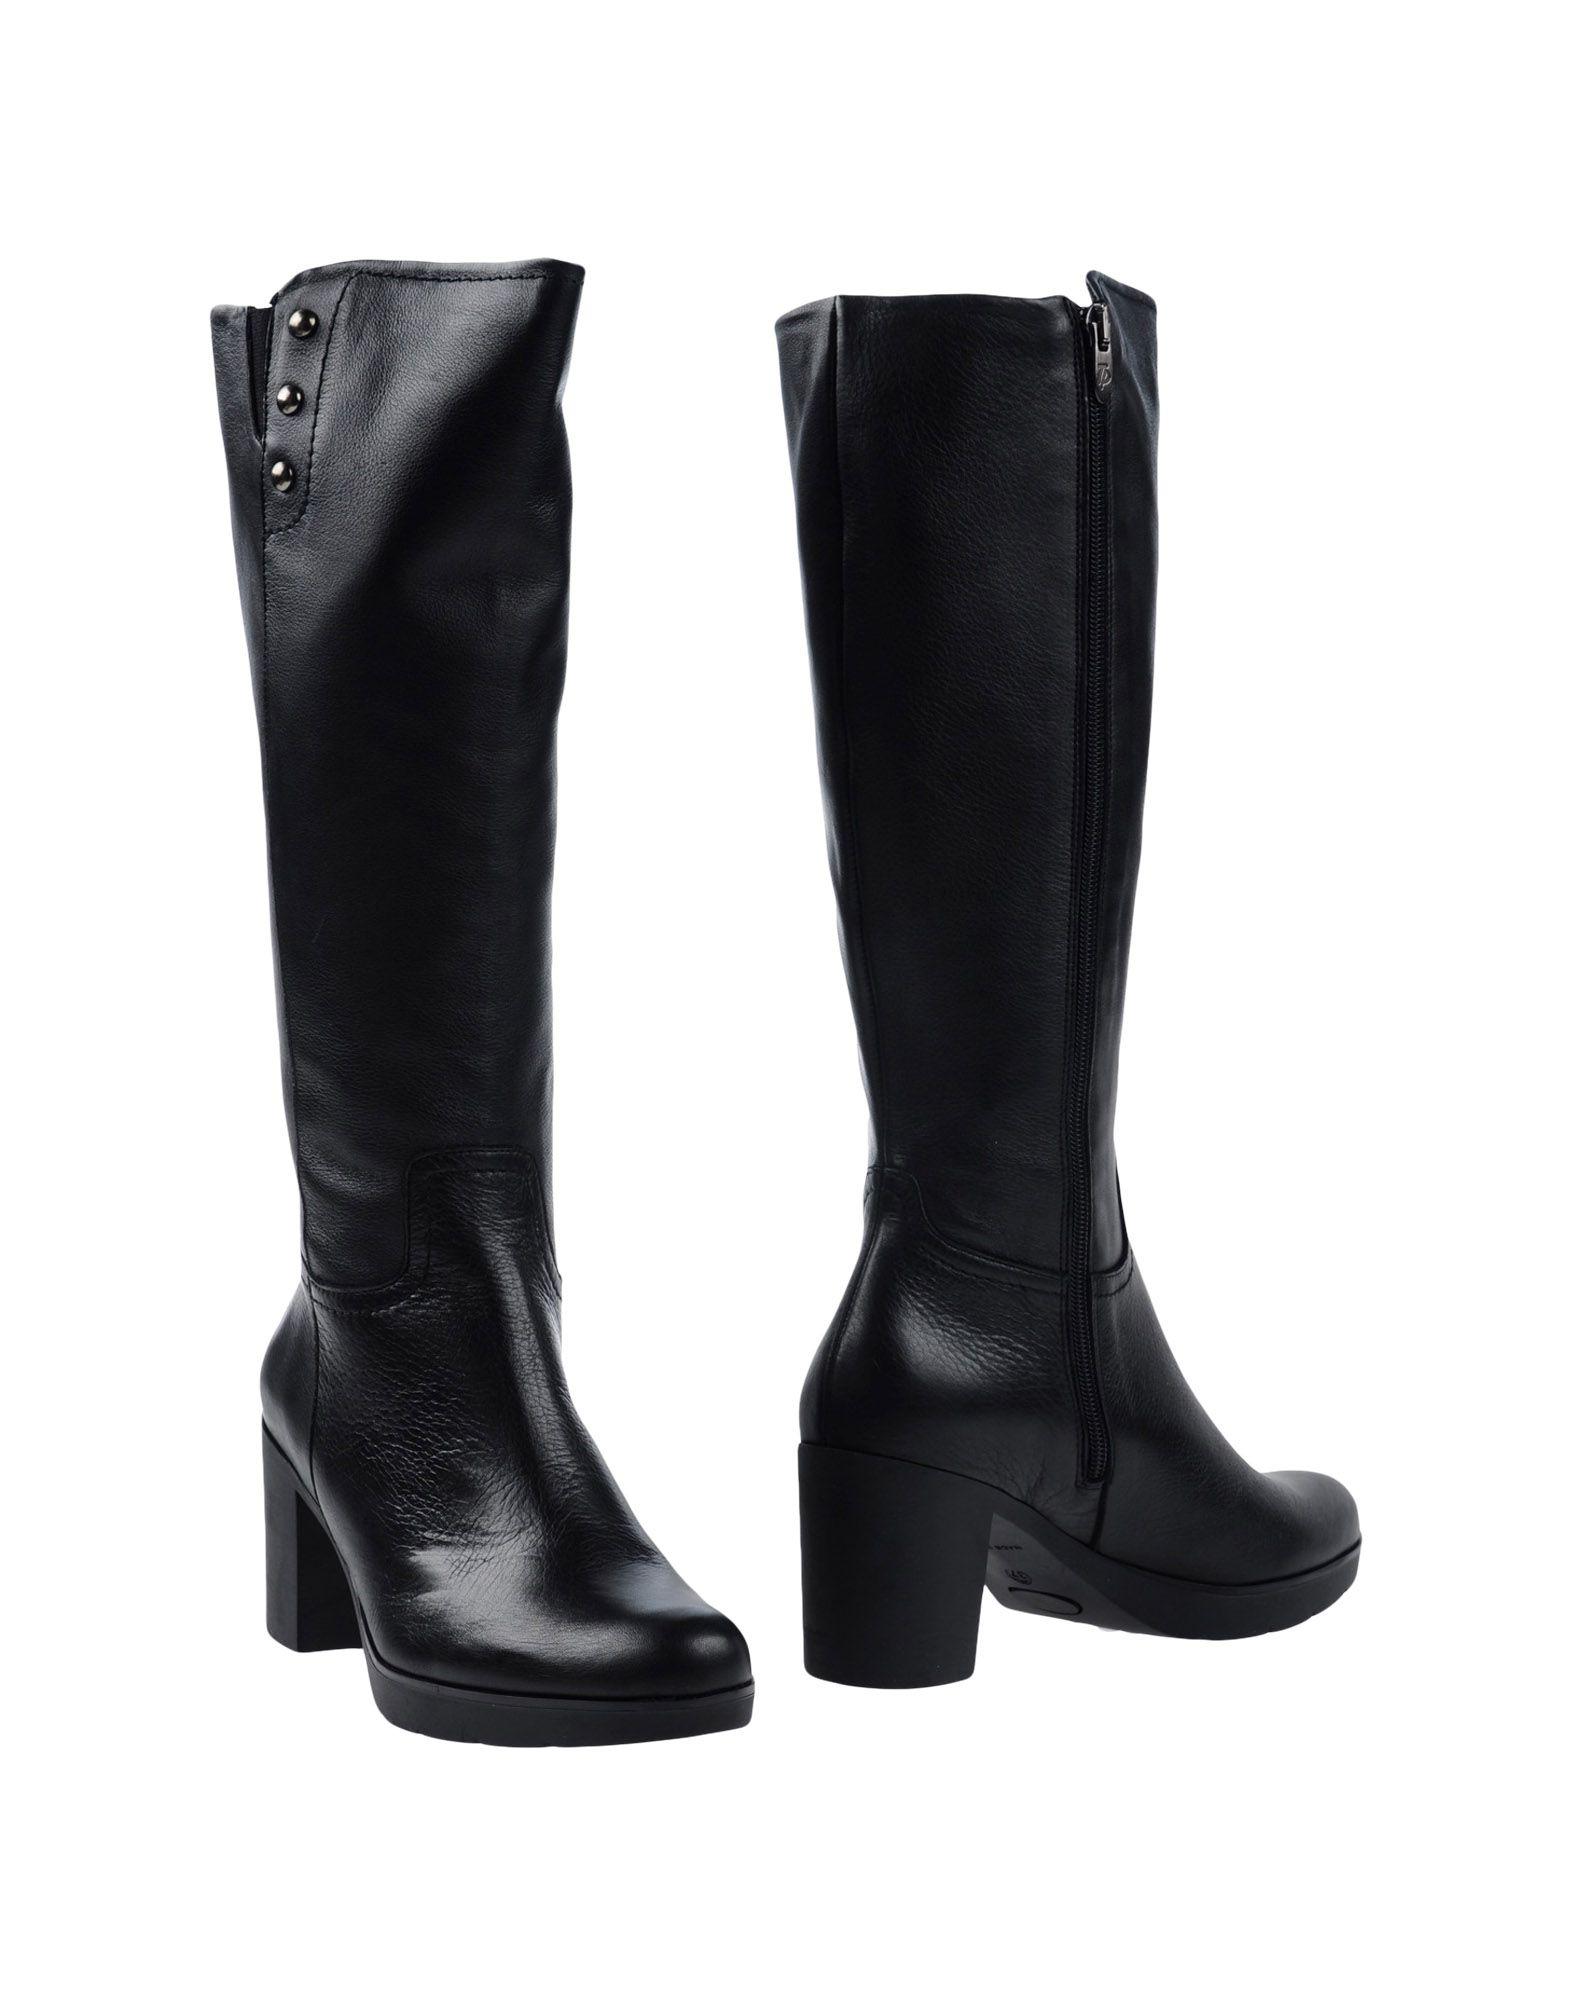 Toni Pons Stiefel Damen  11269440JB Gute Qualität beliebte Schuhe